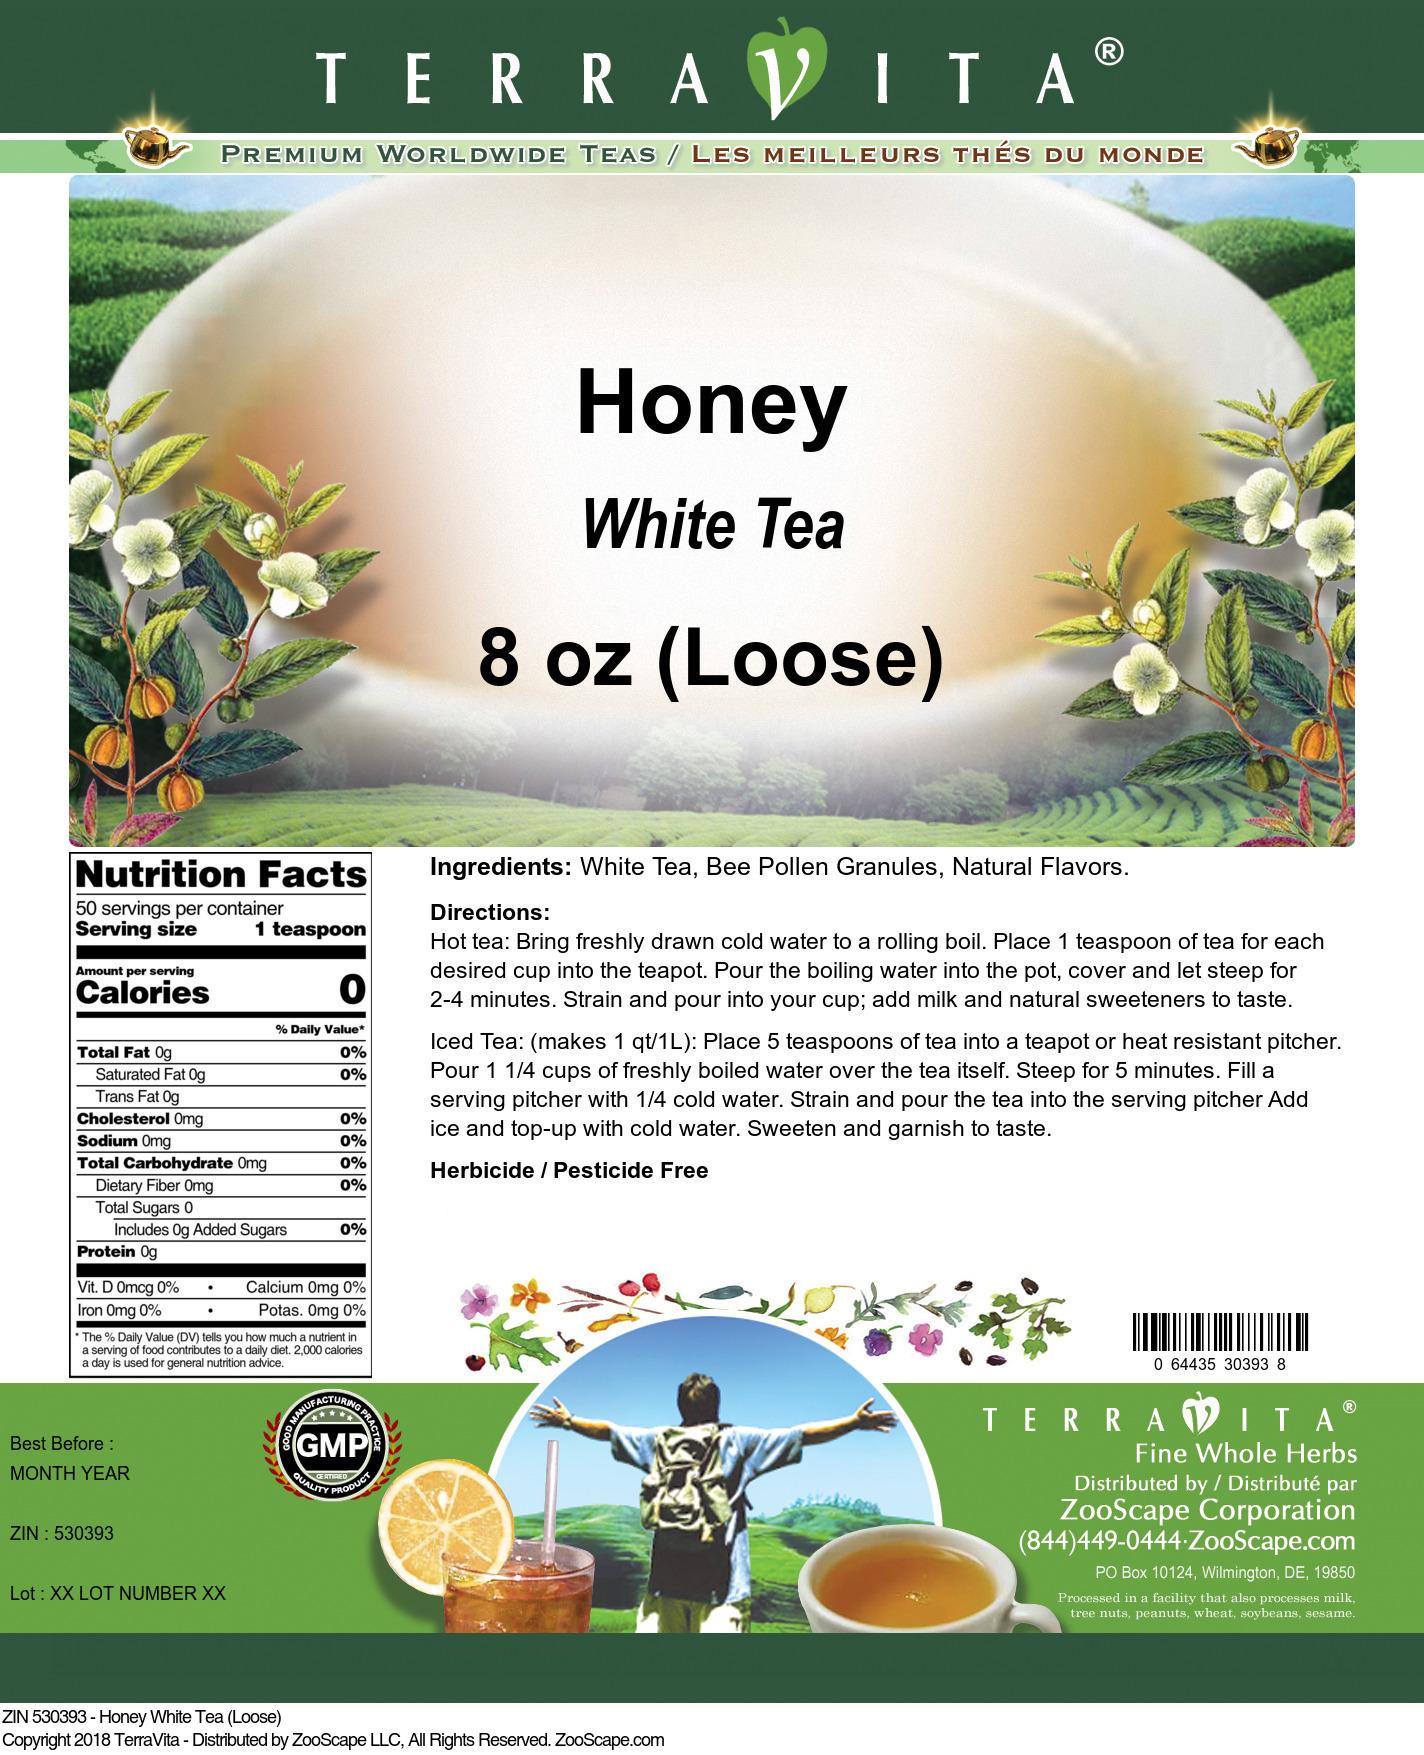 Honey White Tea (Loose)